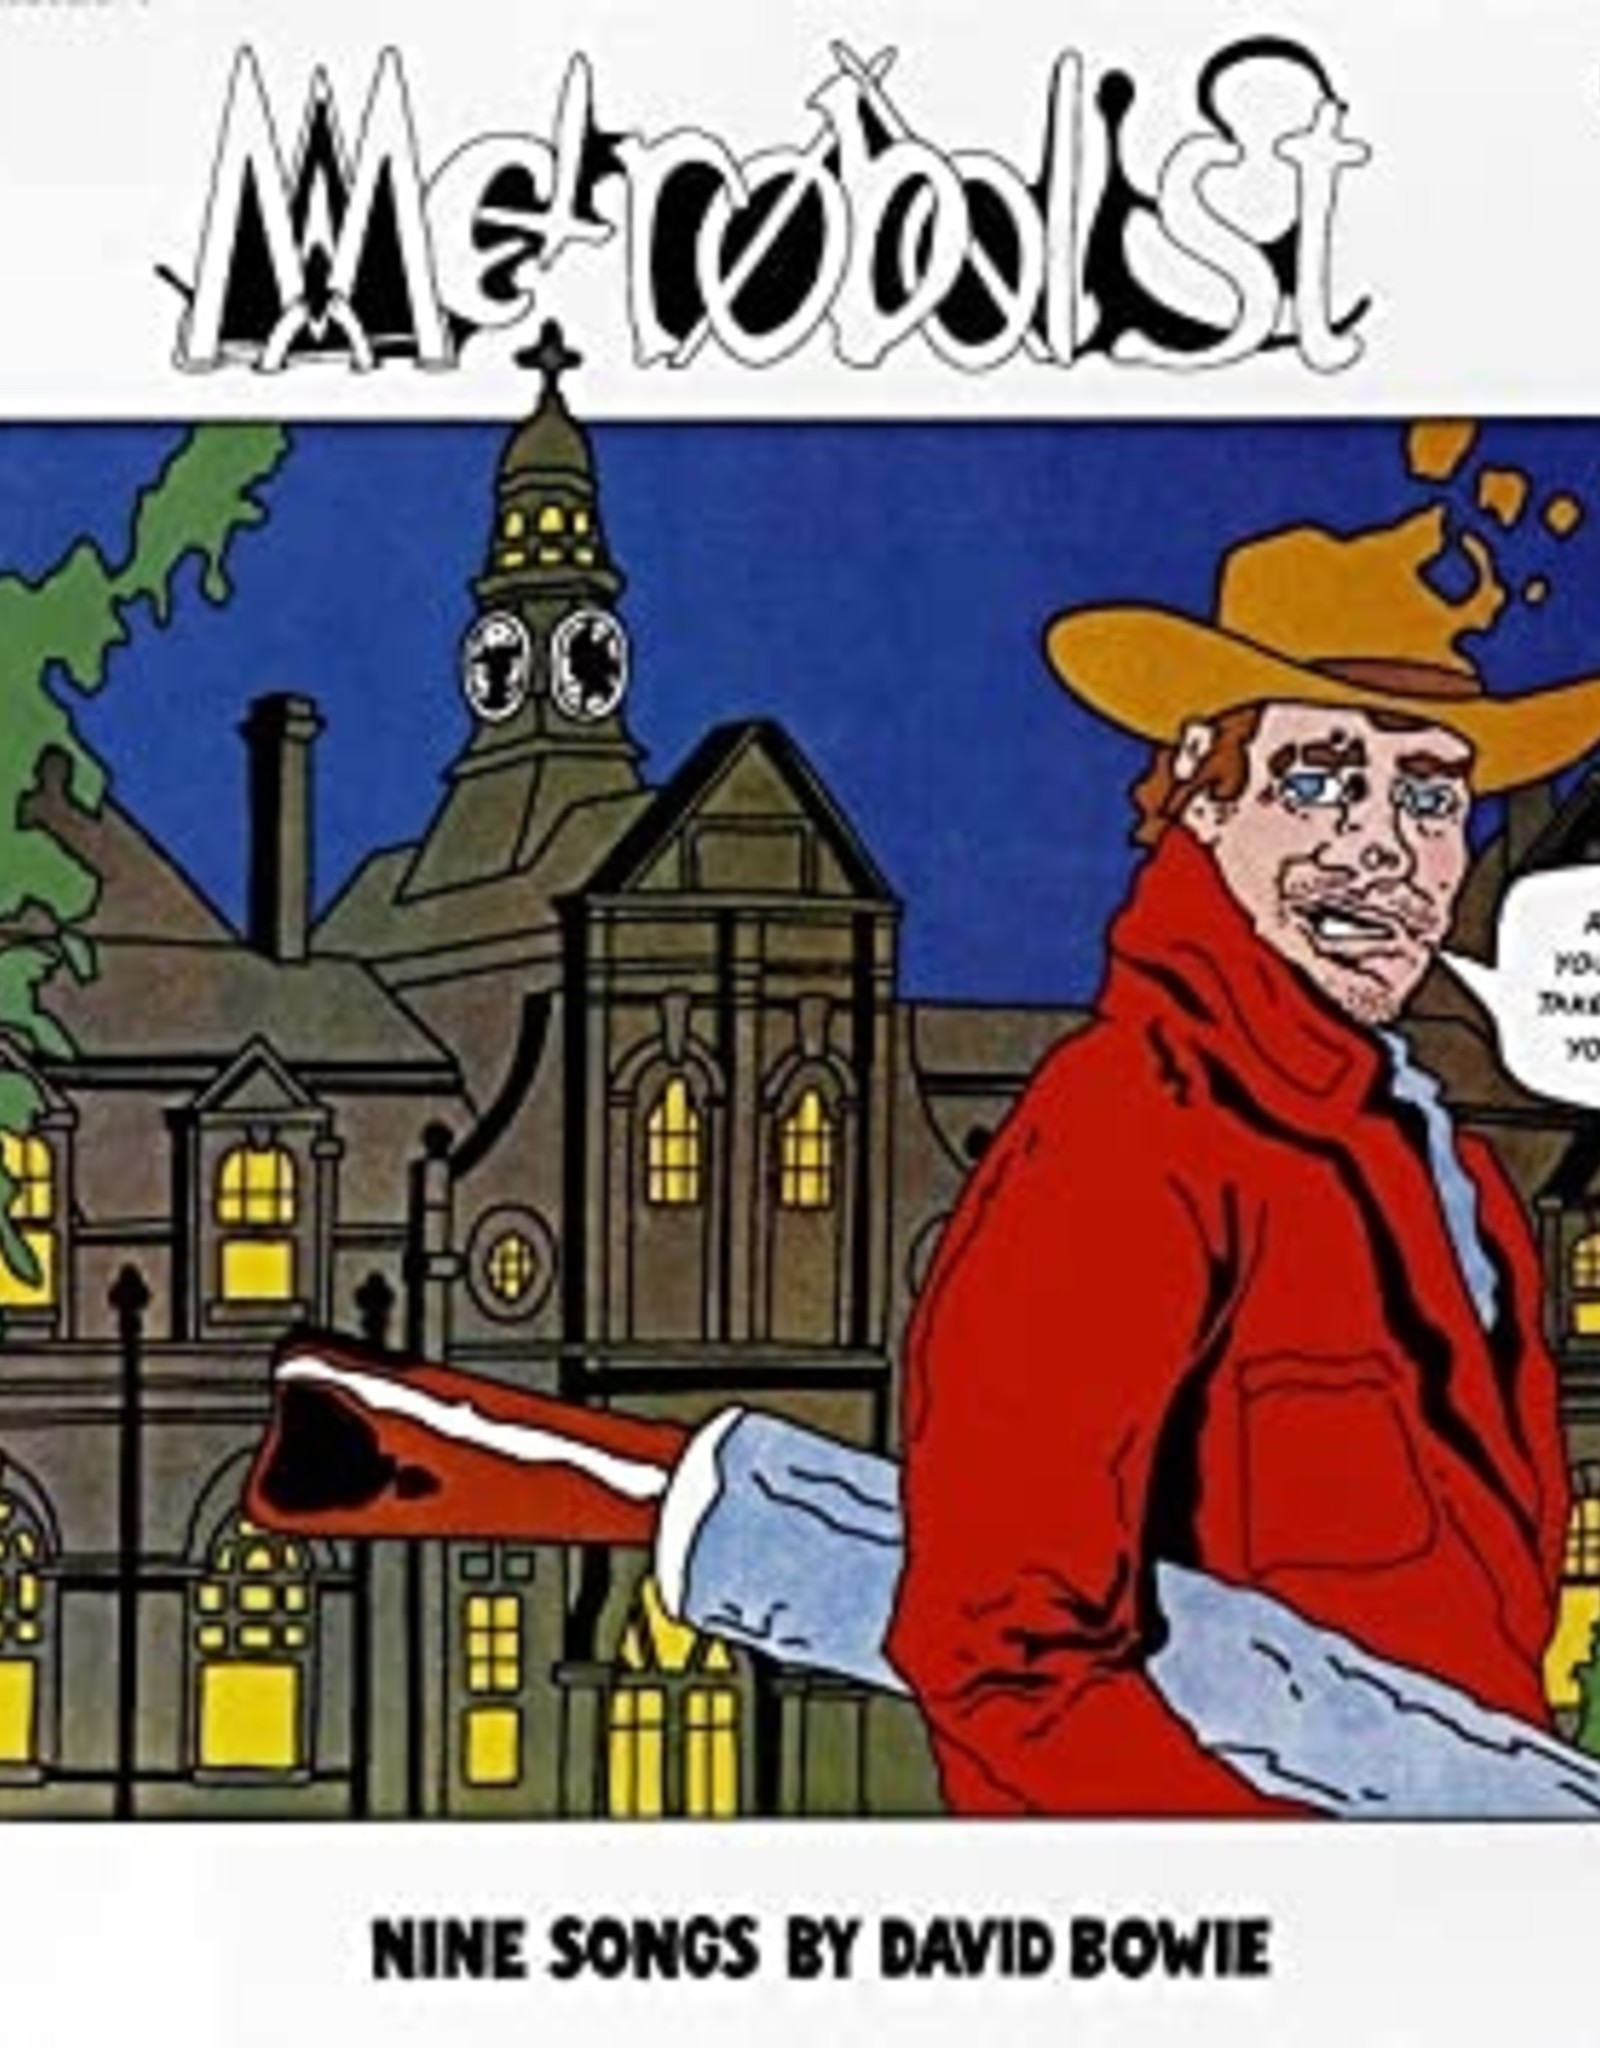 David Bowie - Metrobolits (aka Man Who Sold the World)